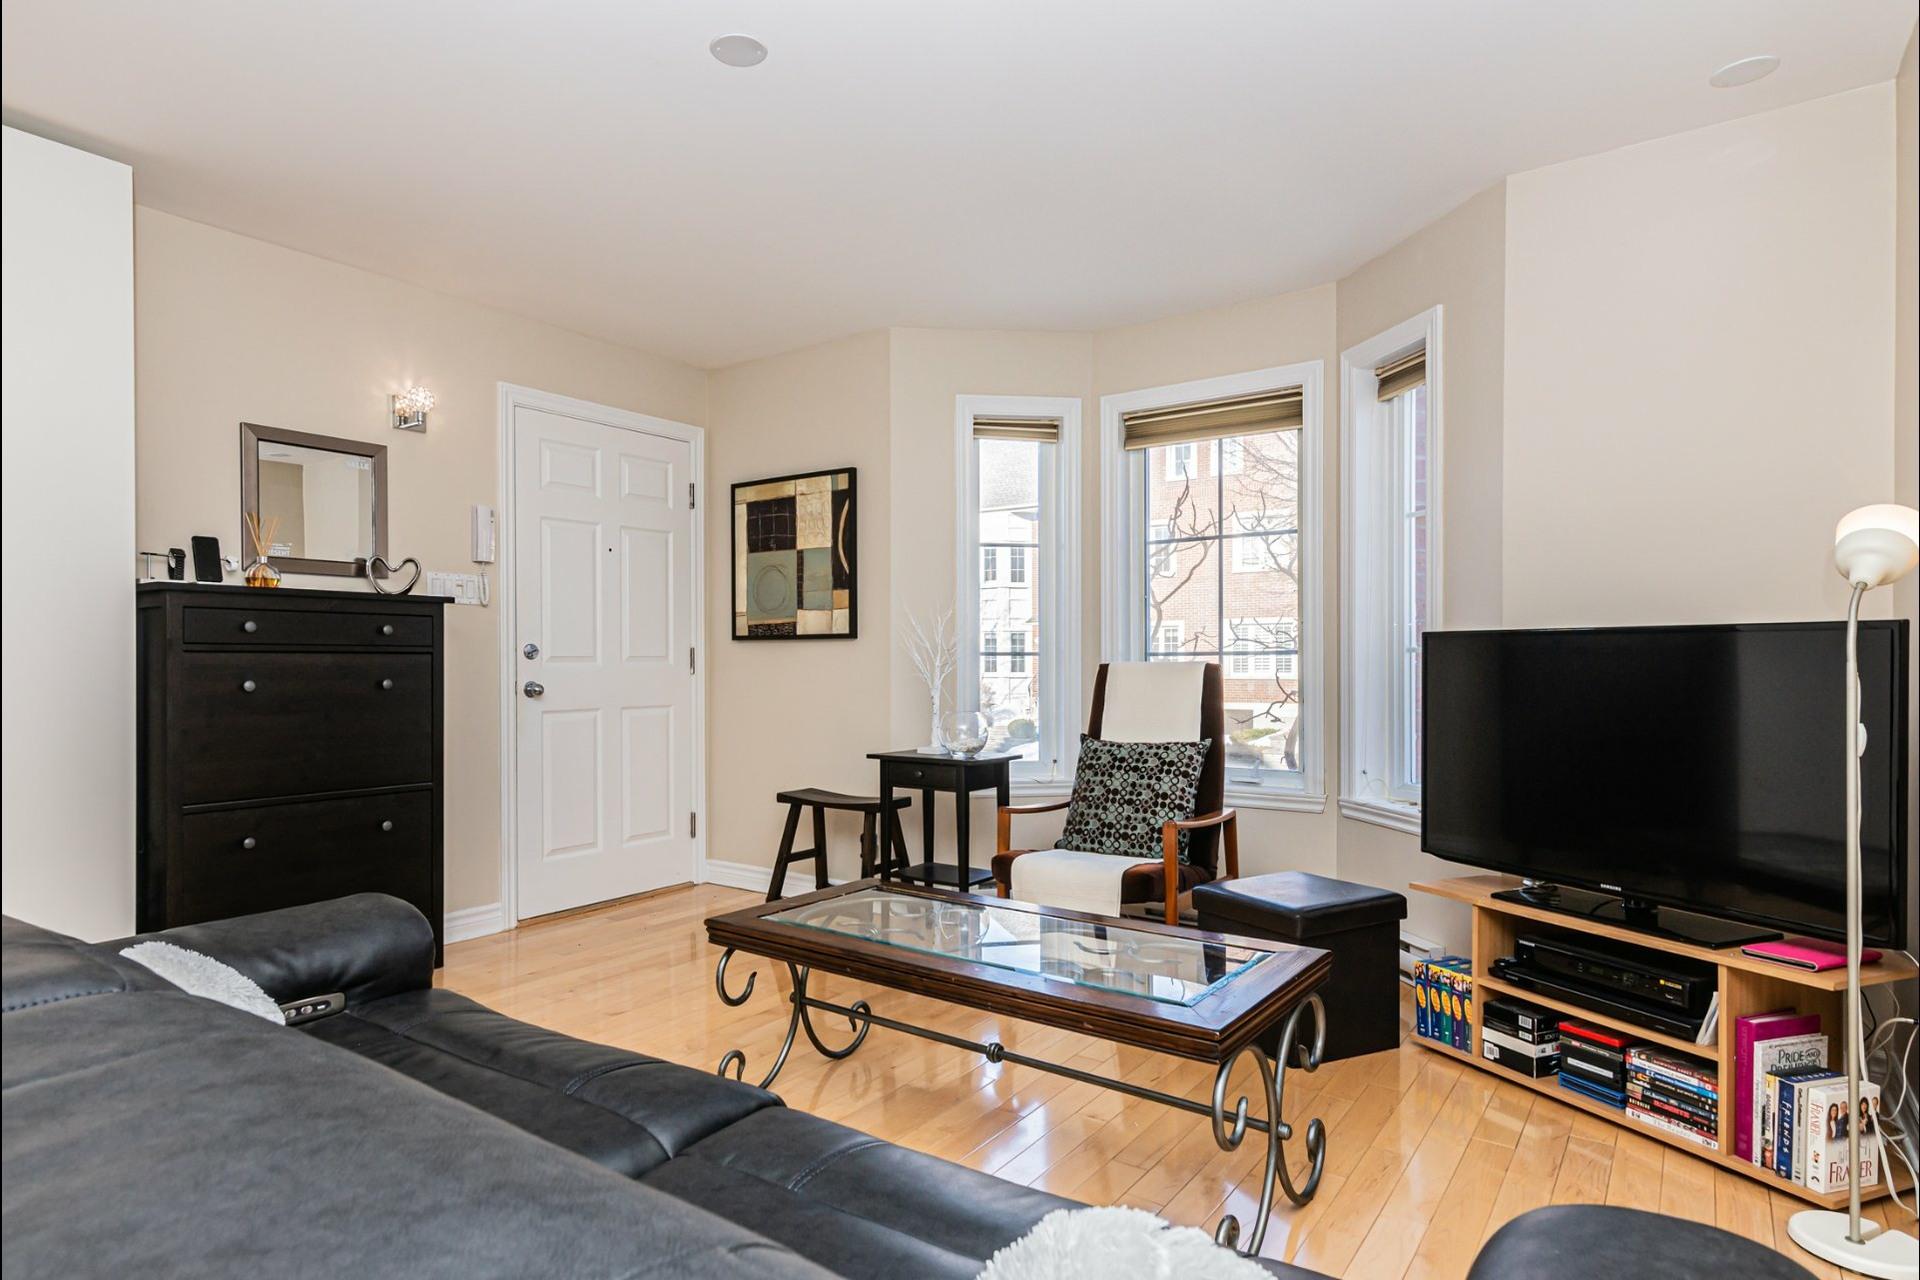 image 3 - Departamento En venta Saint-Laurent Montréal  - 4 habitaciones